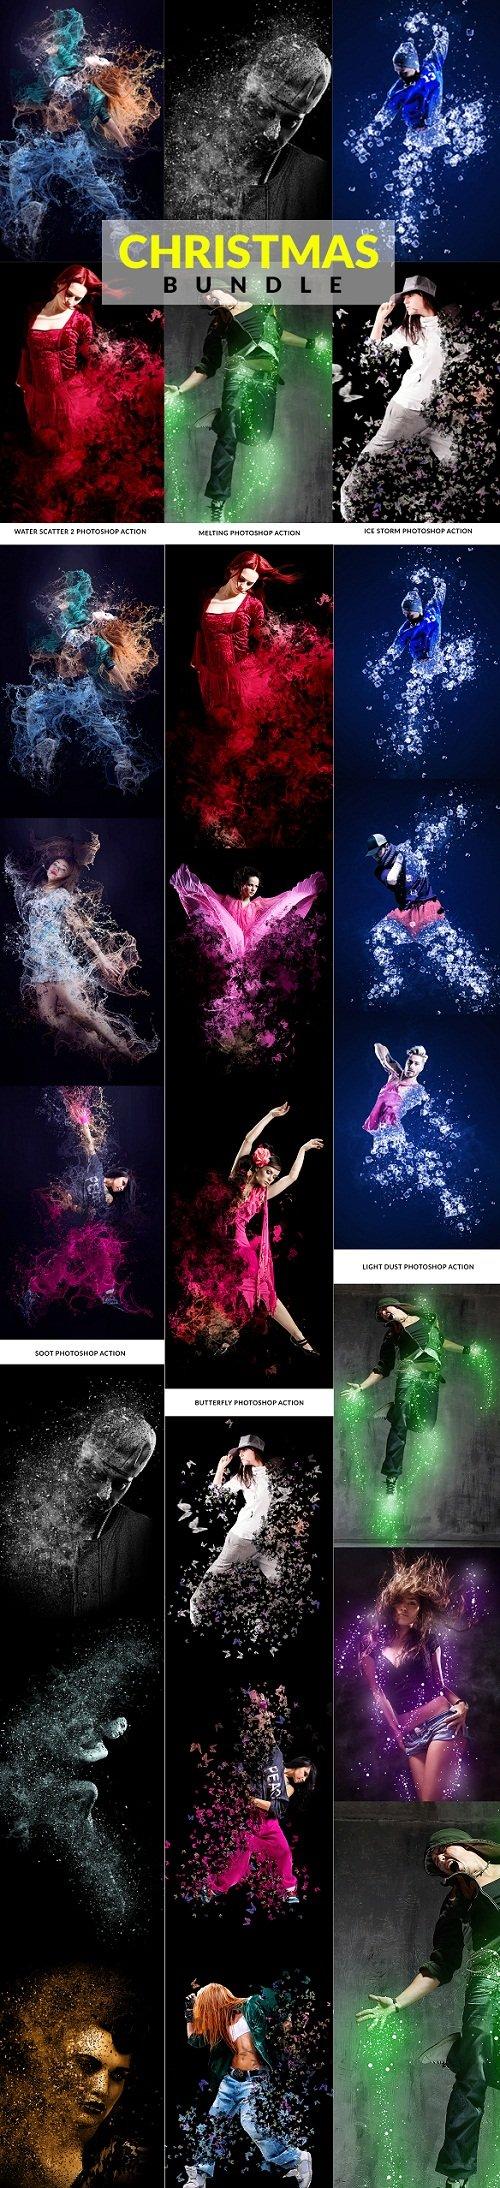 Christmas Photoshop Action Bundle 22813011